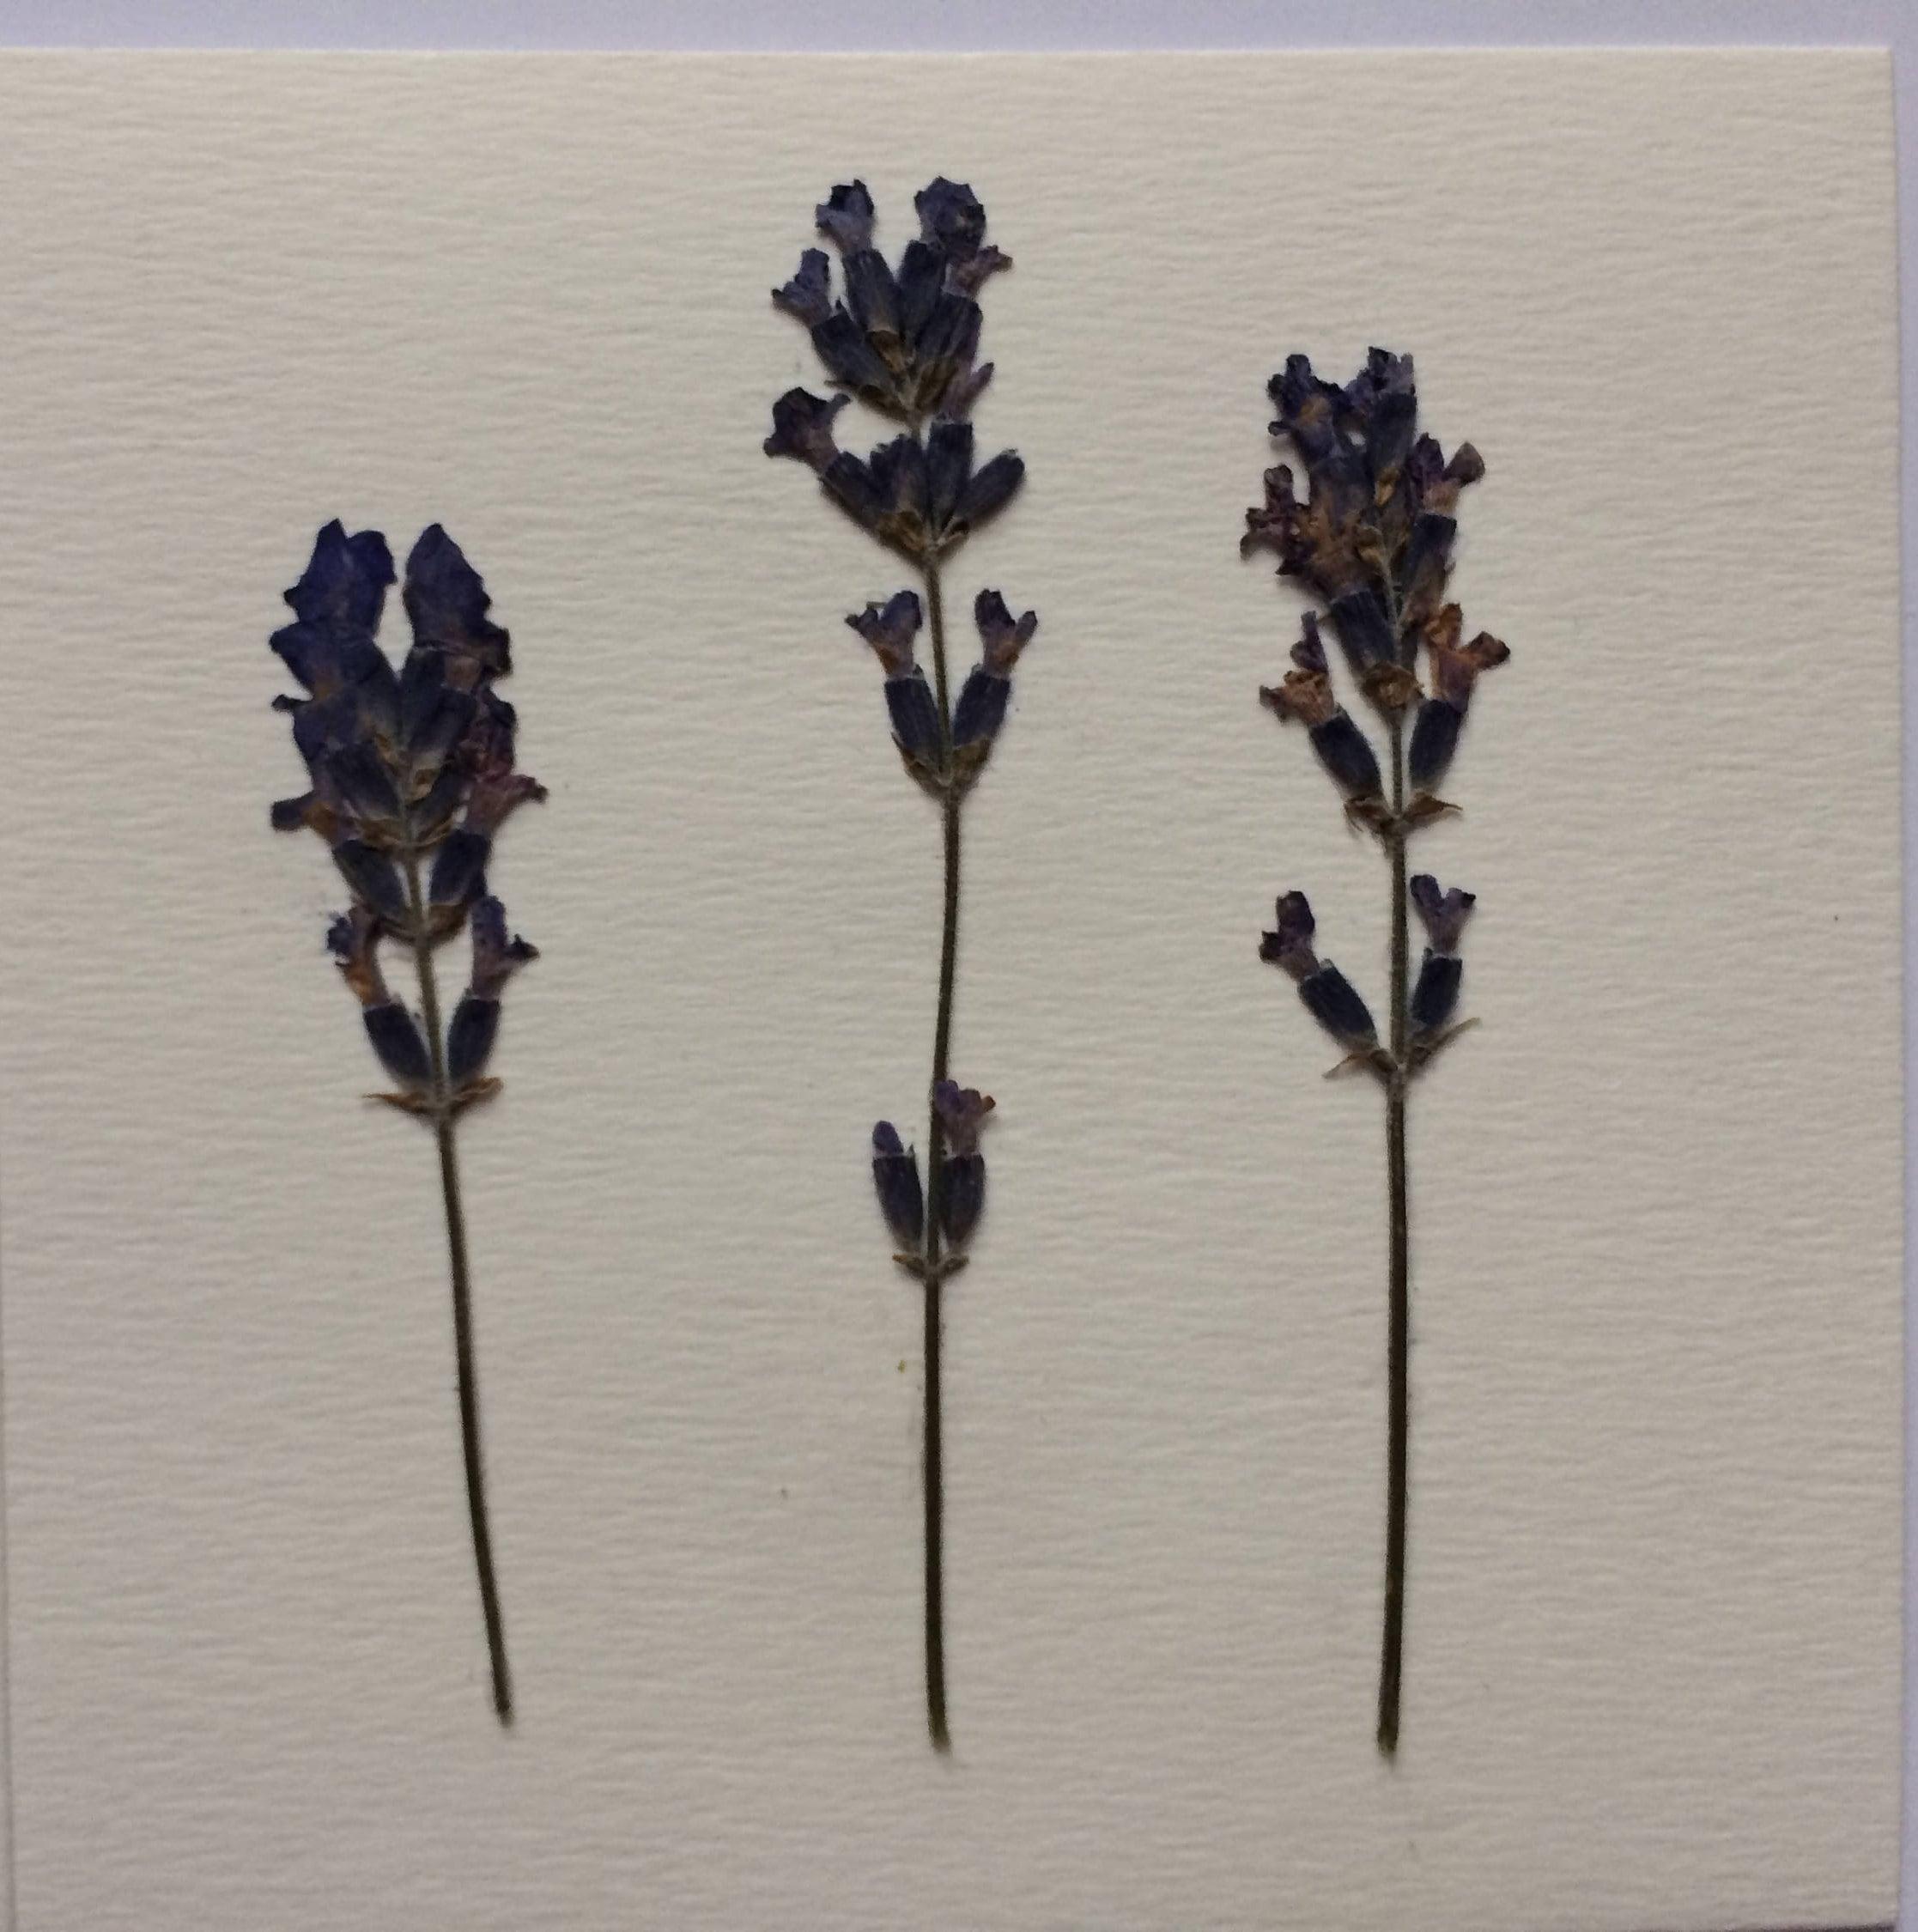 Getrocknete gepresste Lavendel gepresste Blumen-Karte